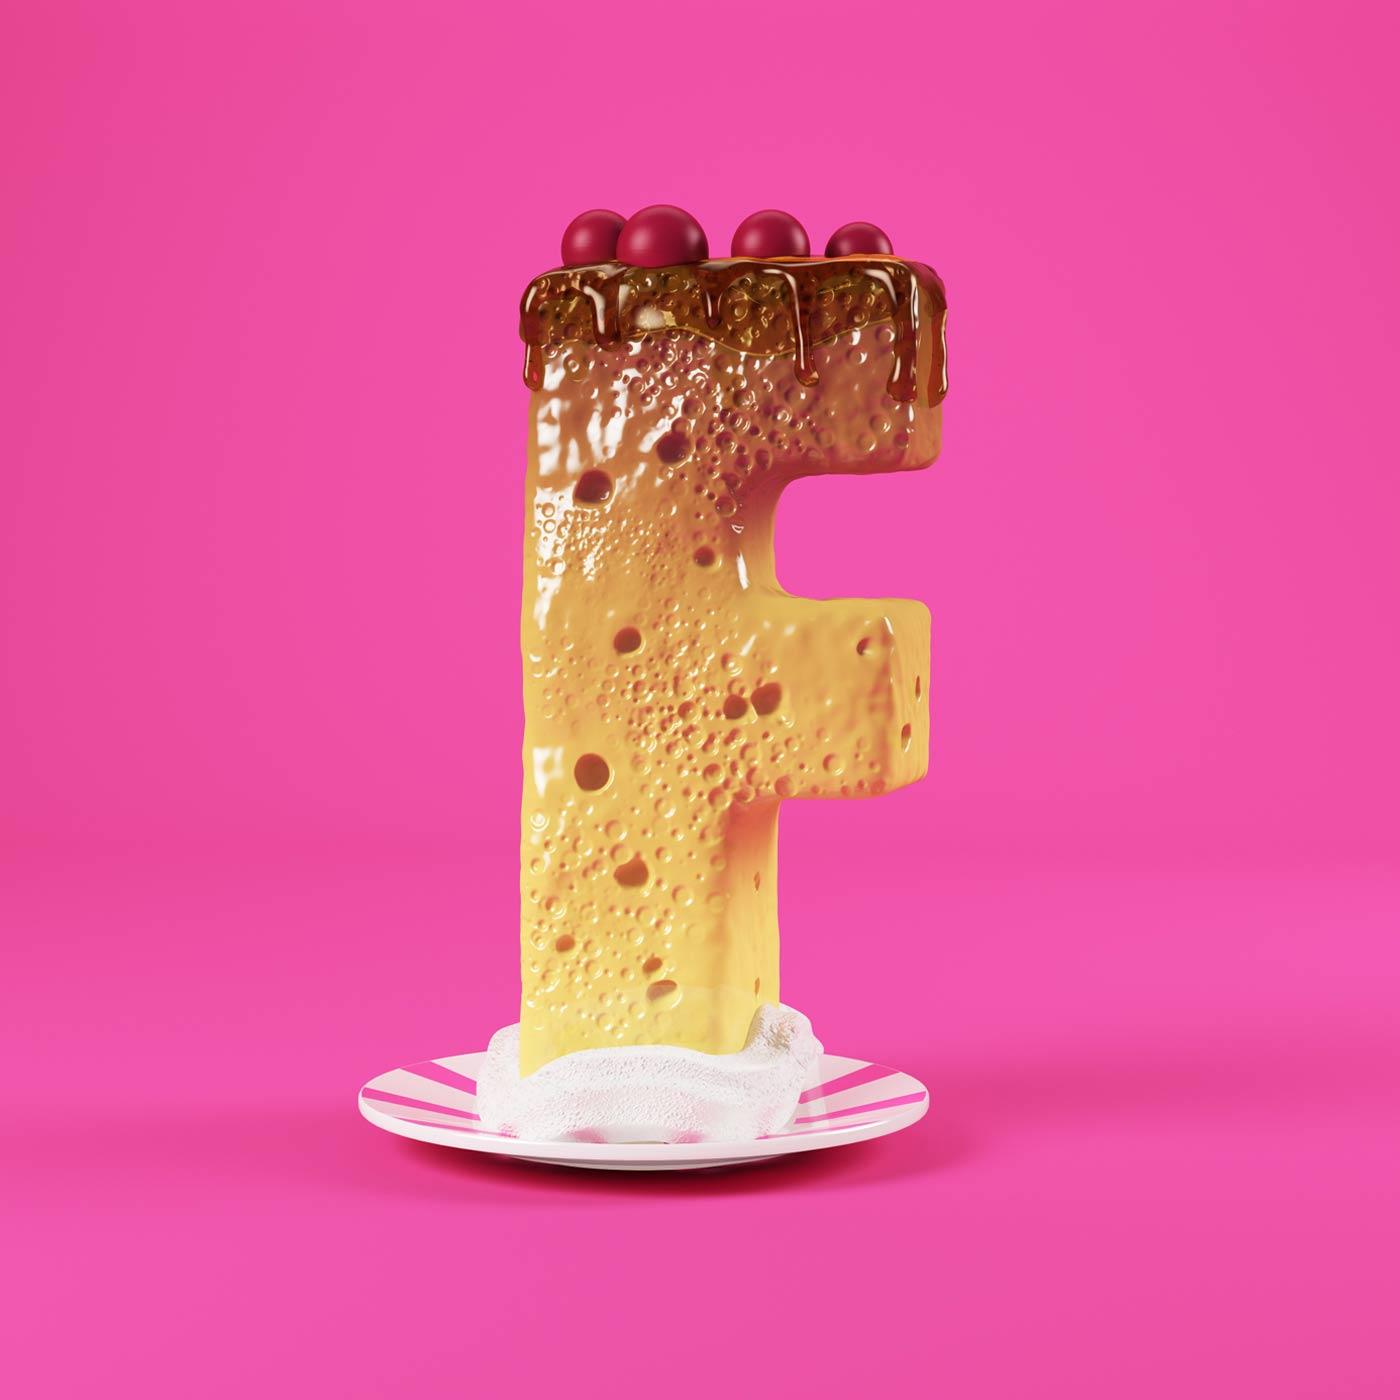 FOOD 3DFOOD FOODALPHABET CESS 3D 3DTYPE LETTERING CGI 3DARTIST DESSERT